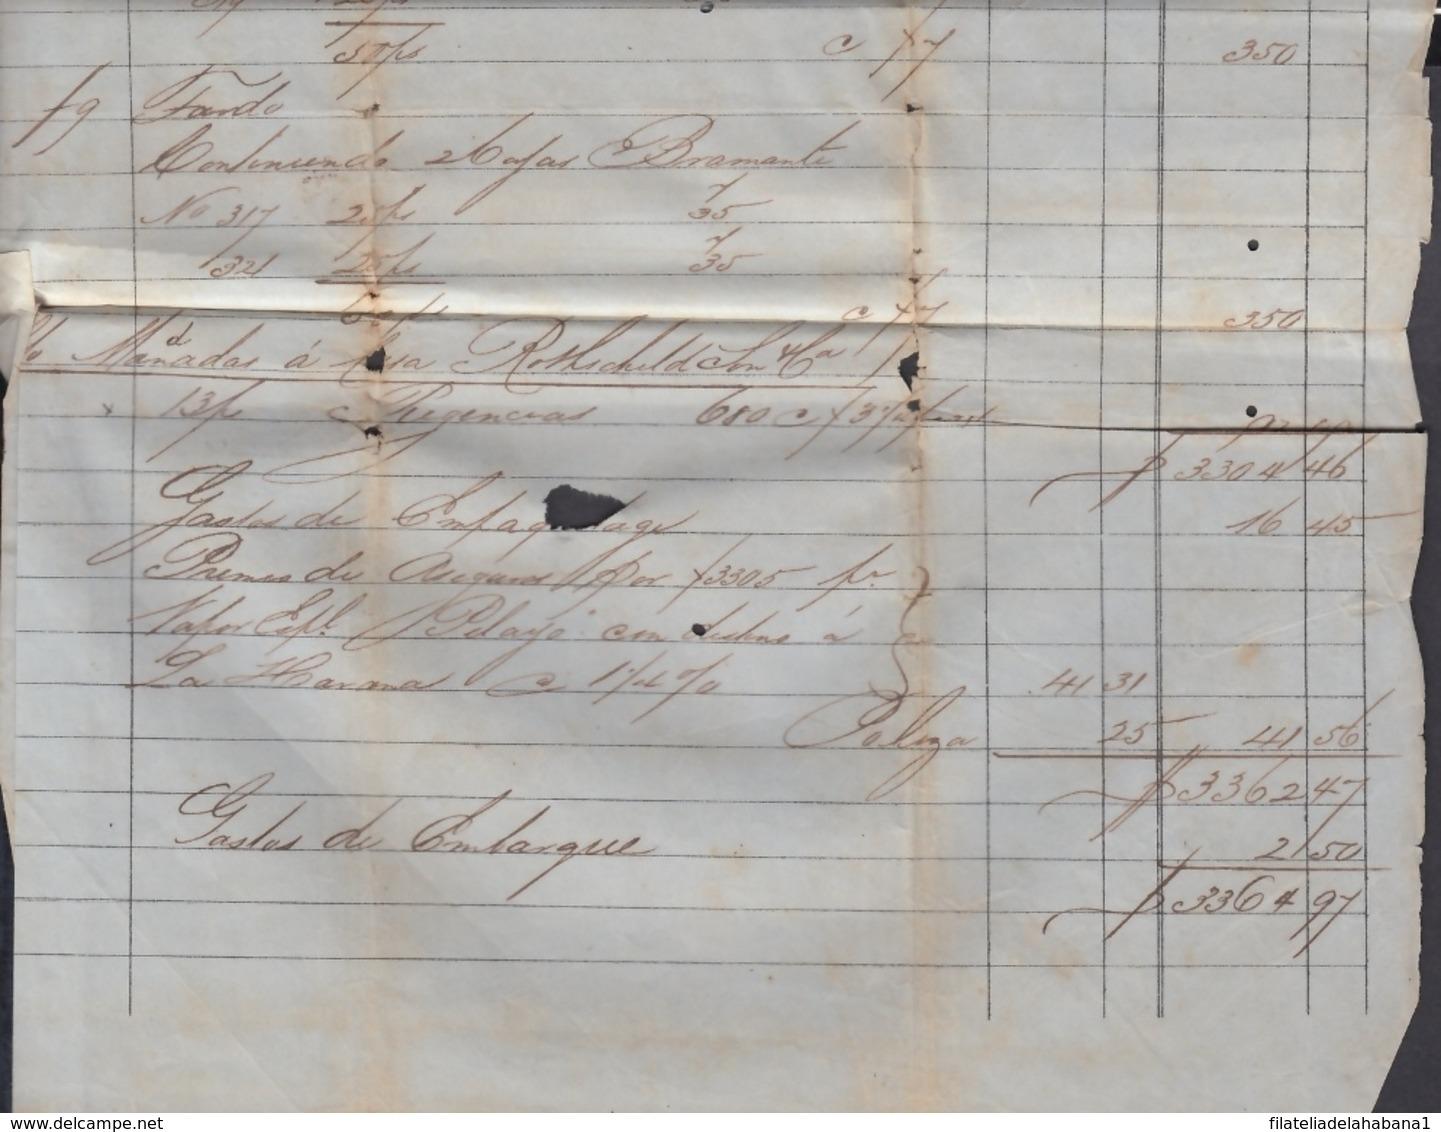 E6280 SAINT THOMAS 1867 INVOICE TO HAVANA CUBA SPAIN. - Documentos Históricos